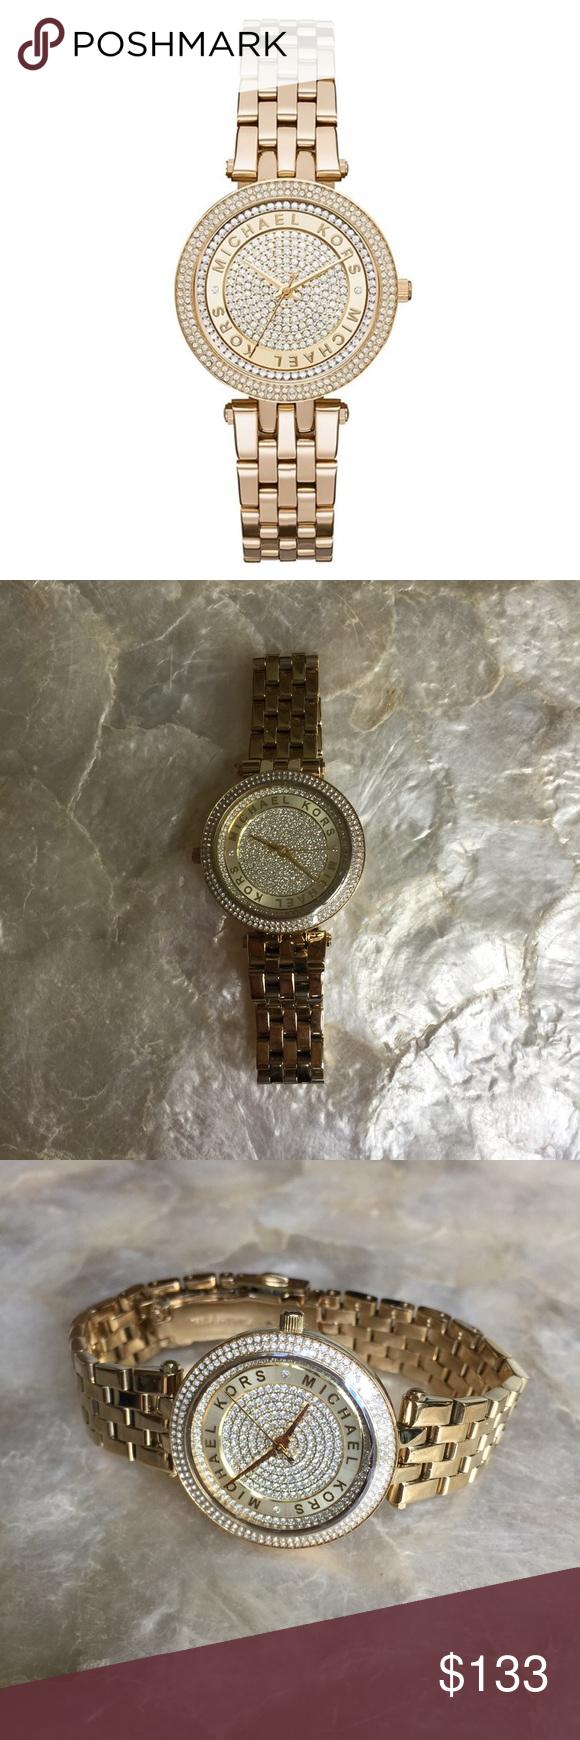 59aa78f08856 Michael Kors Mini Darci Crystal Pave Watch MK3445 100% authentic Michael  Kors Mini Darci Crystal Pave Ladies Watch MK3445. Crystal set bezel and dial .